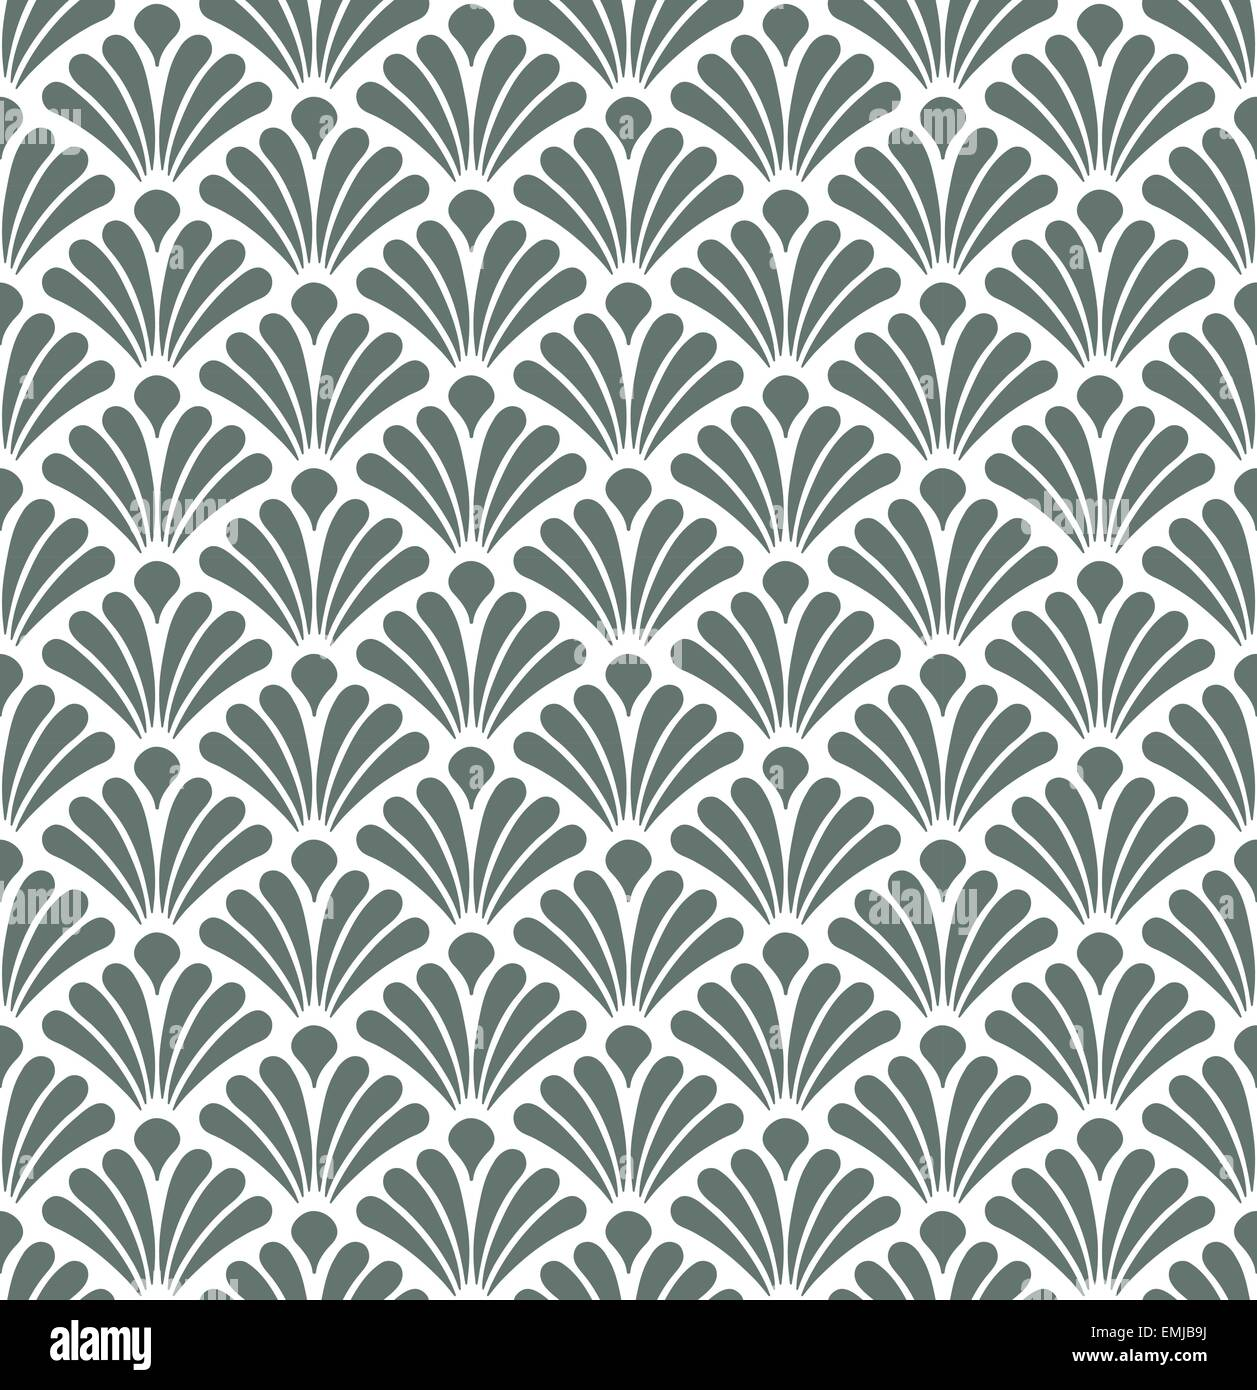 Geometric abstract seamless pattern motif background - Stock Image